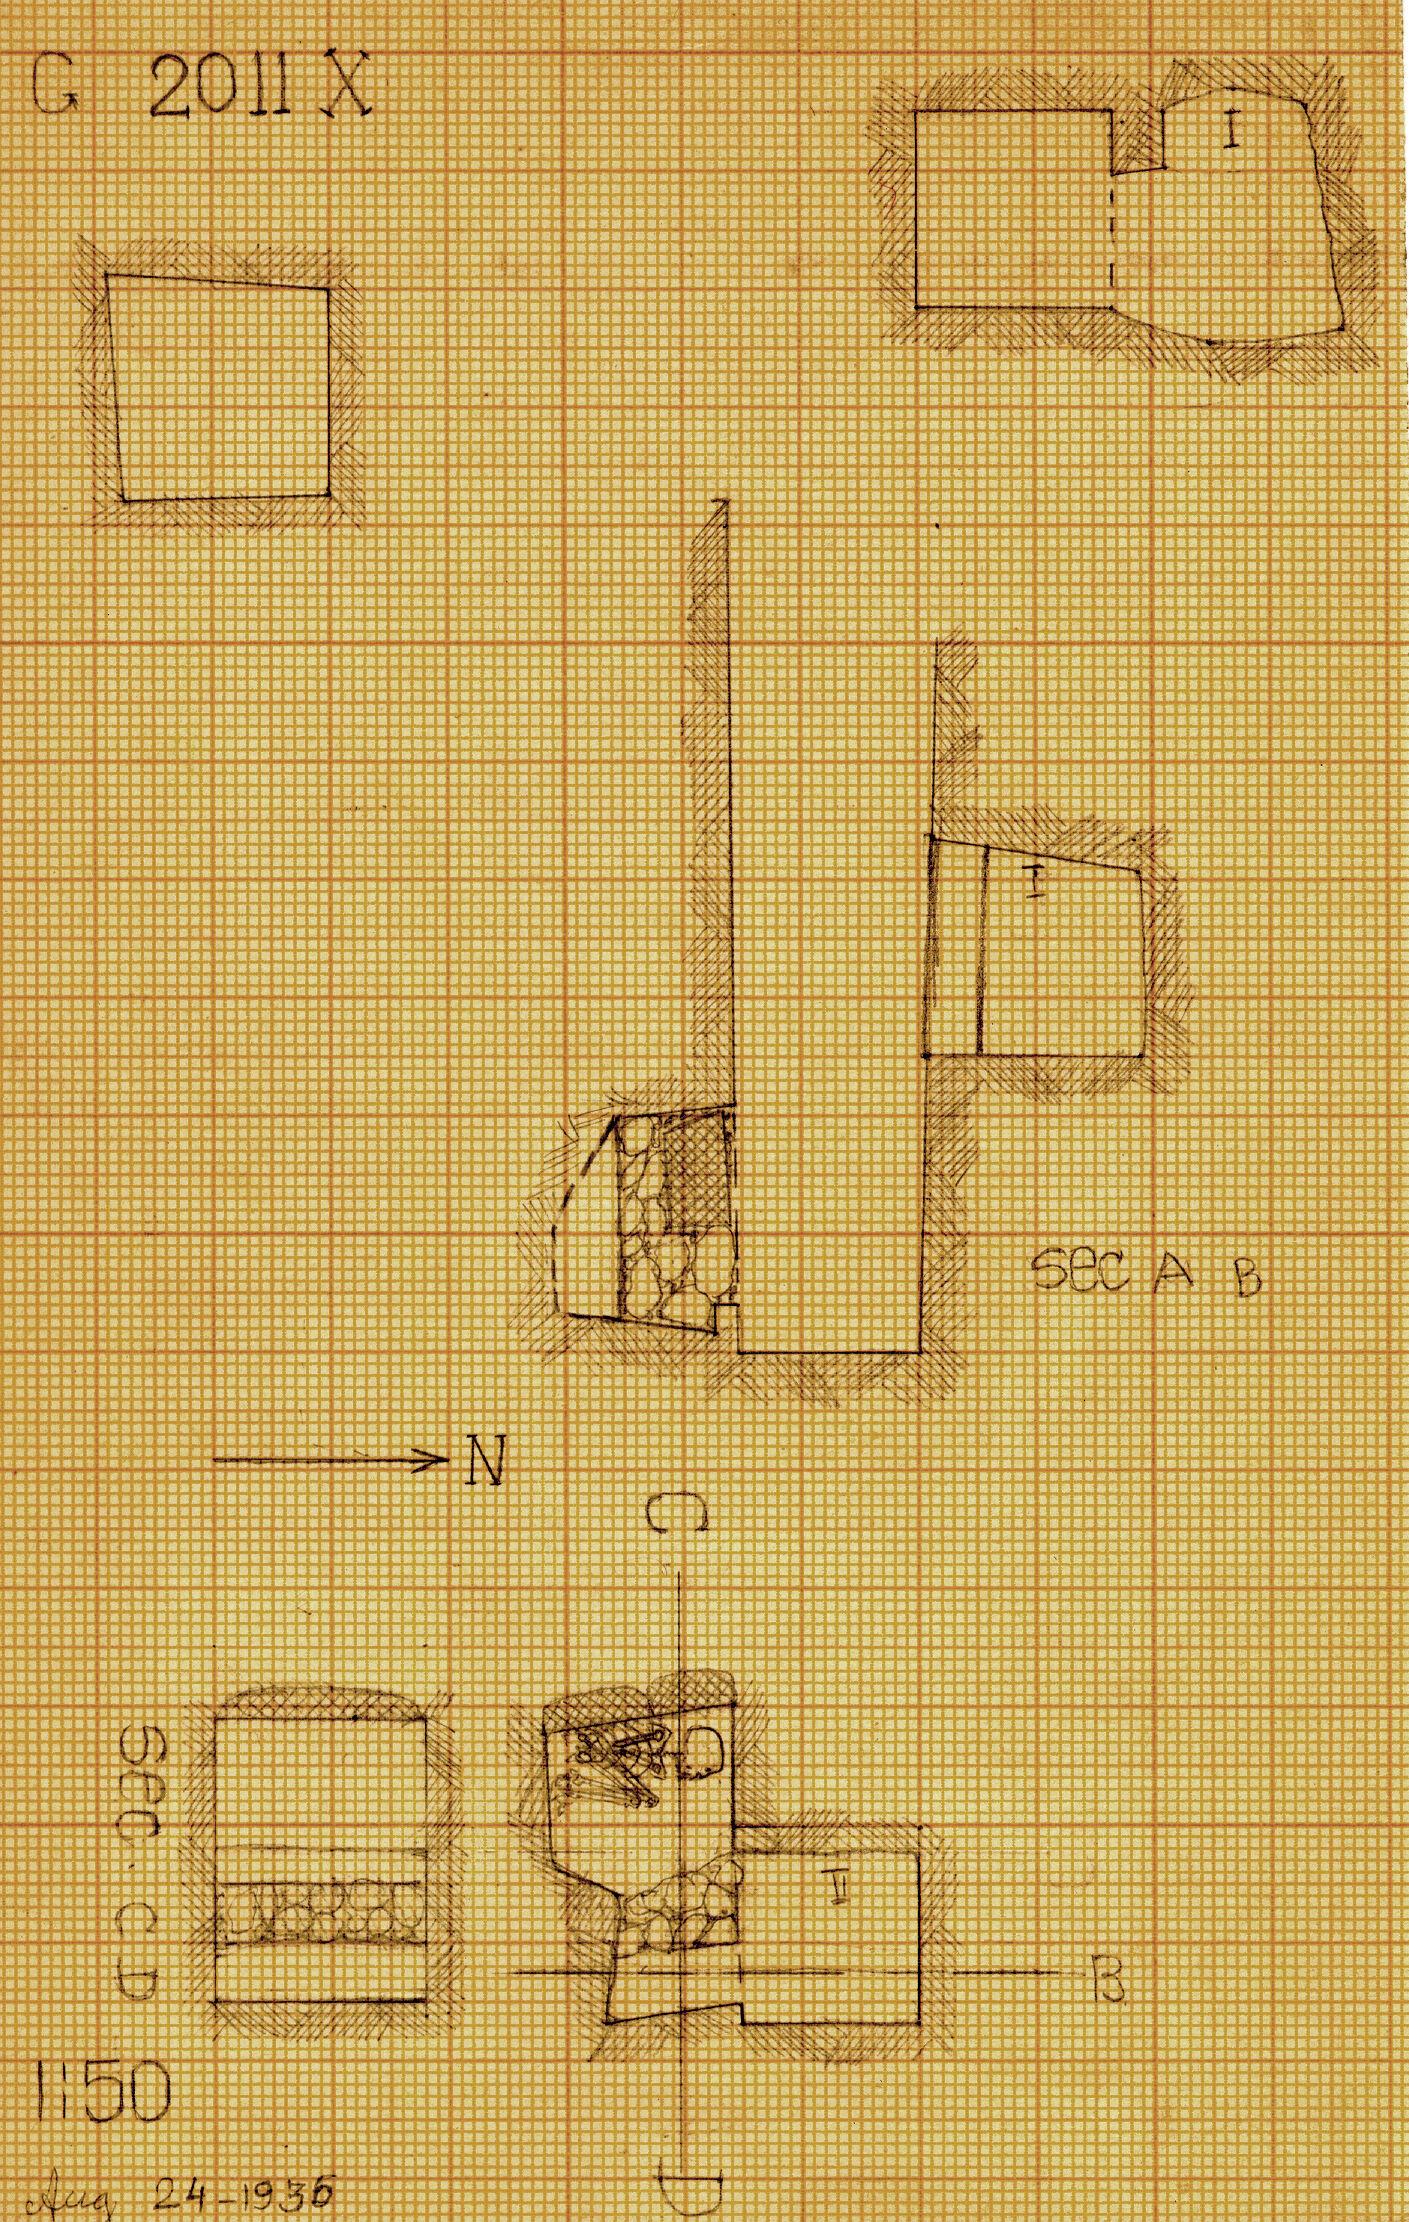 Maps and plans: G 2011, Shaft X (I & II)